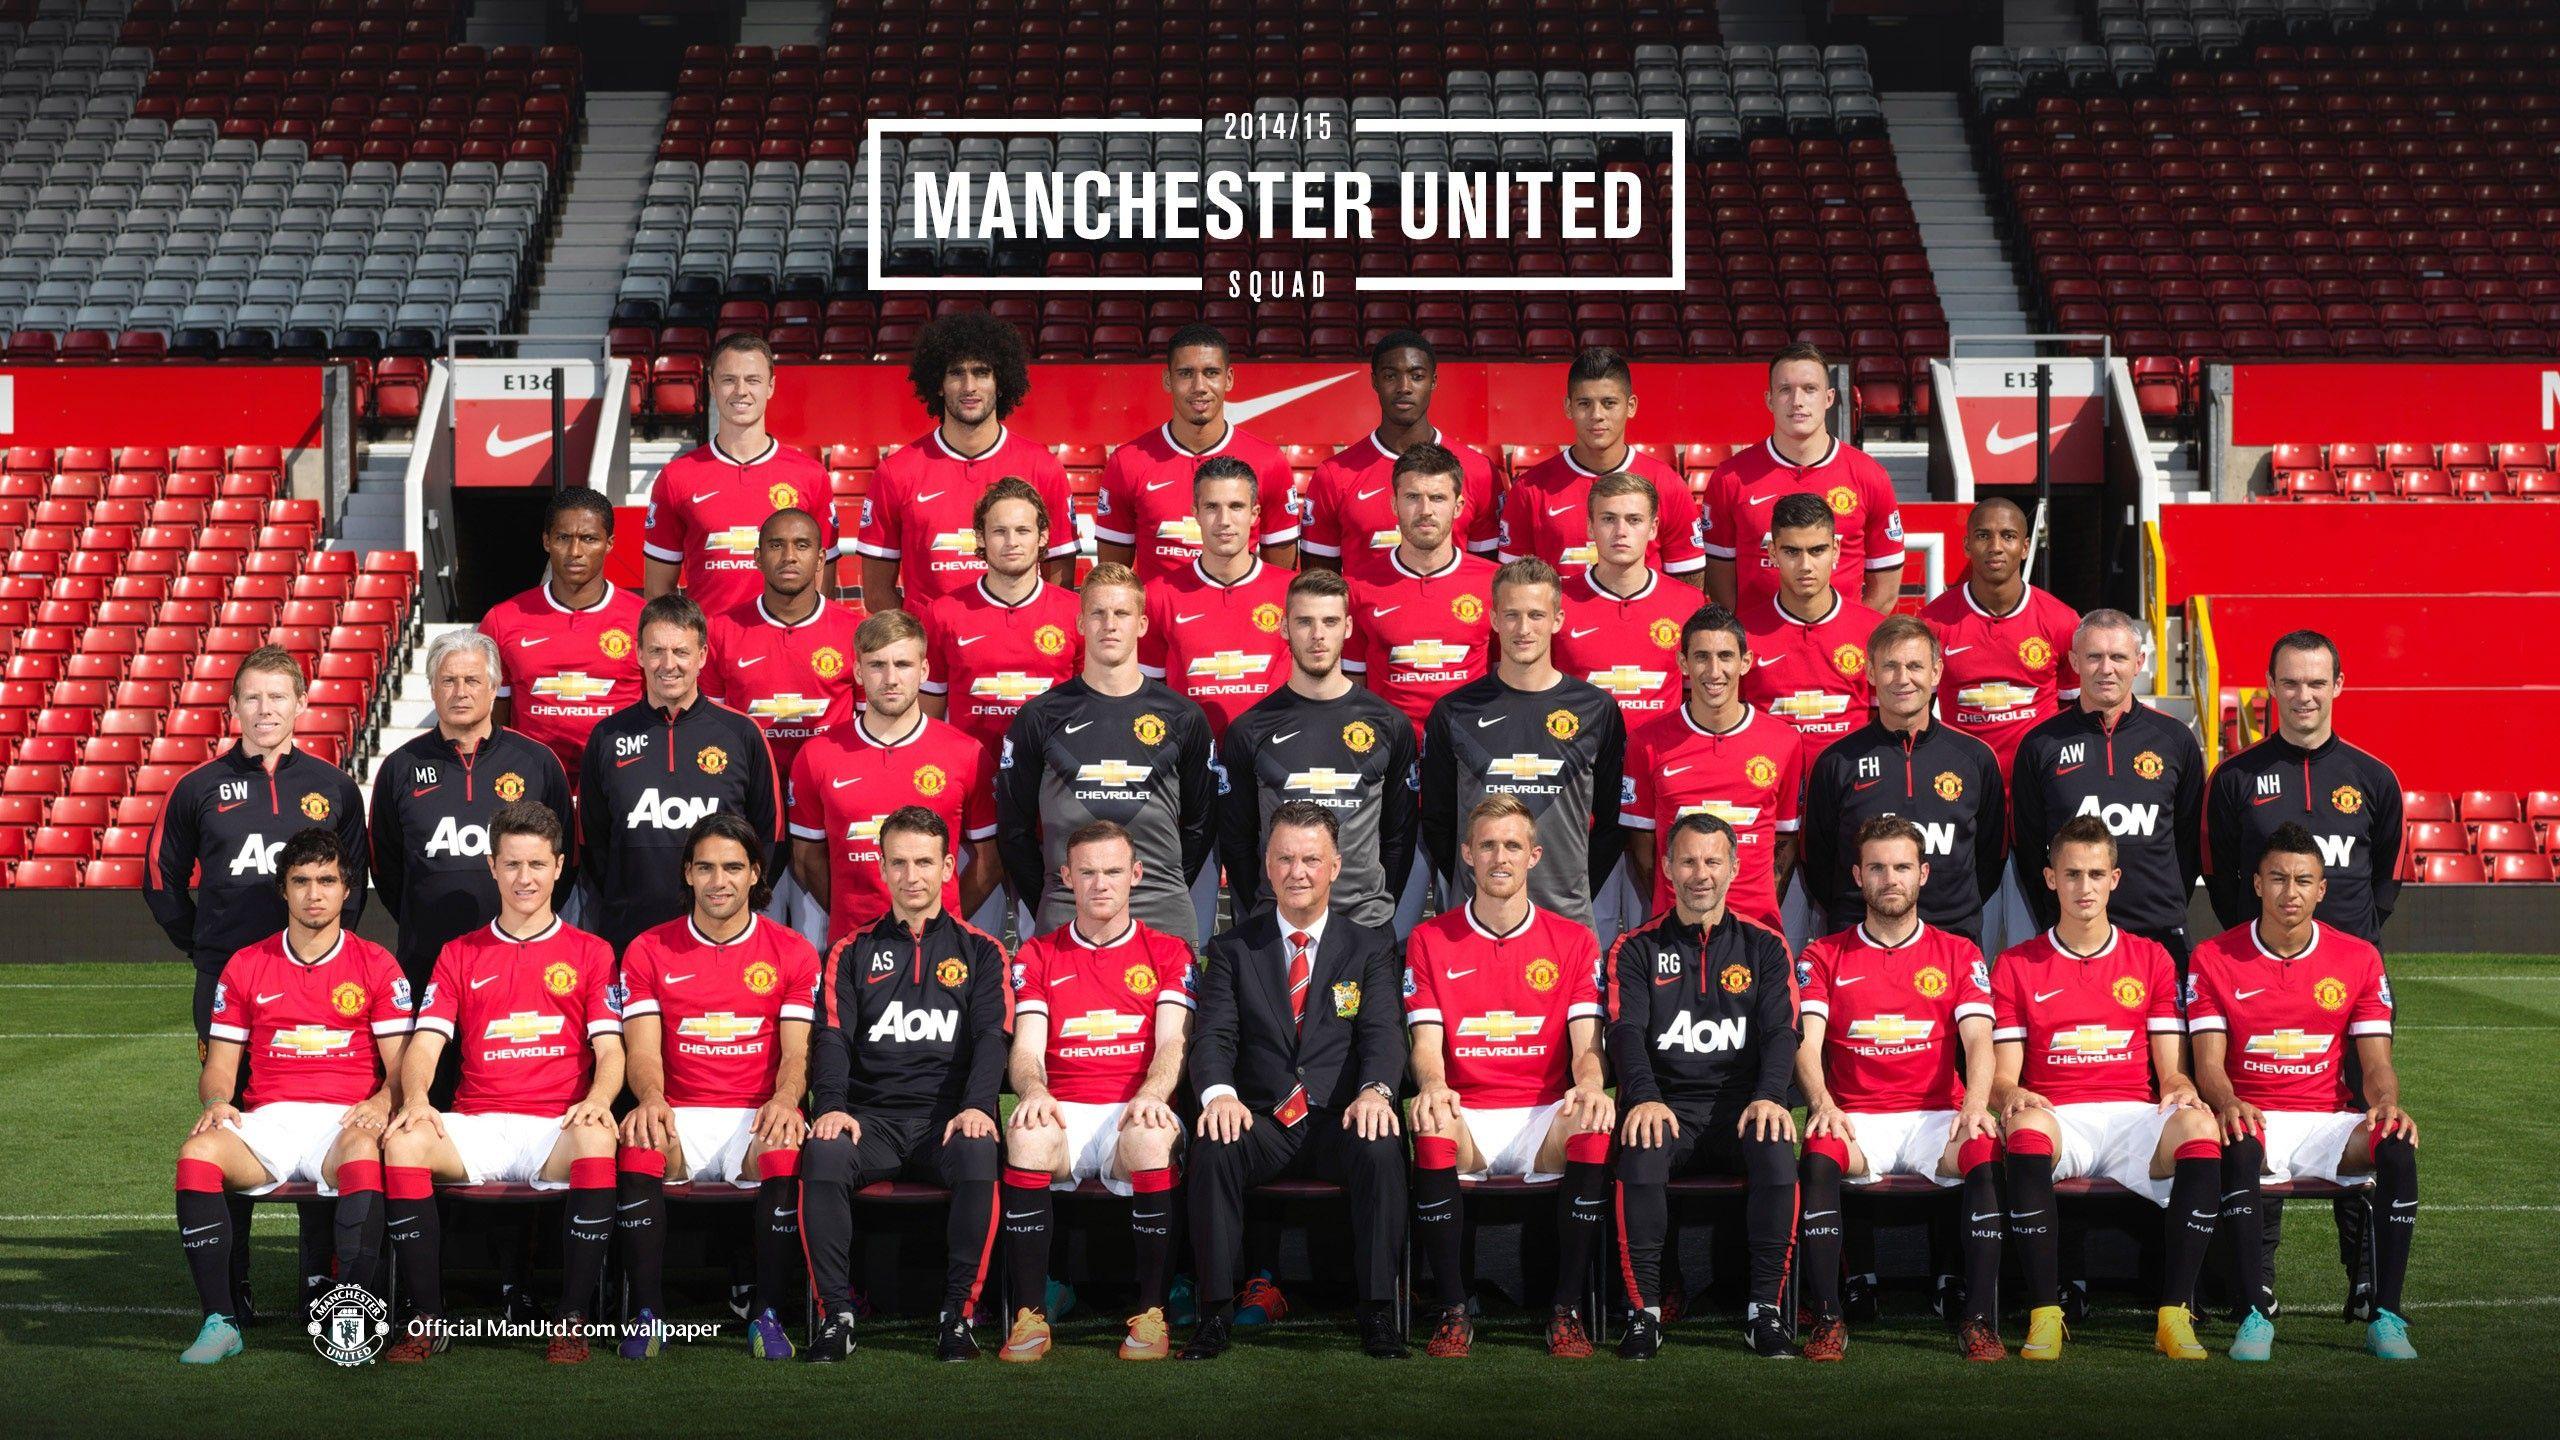 Manchester United Wallpaper Manchester United Squad Wallpaper